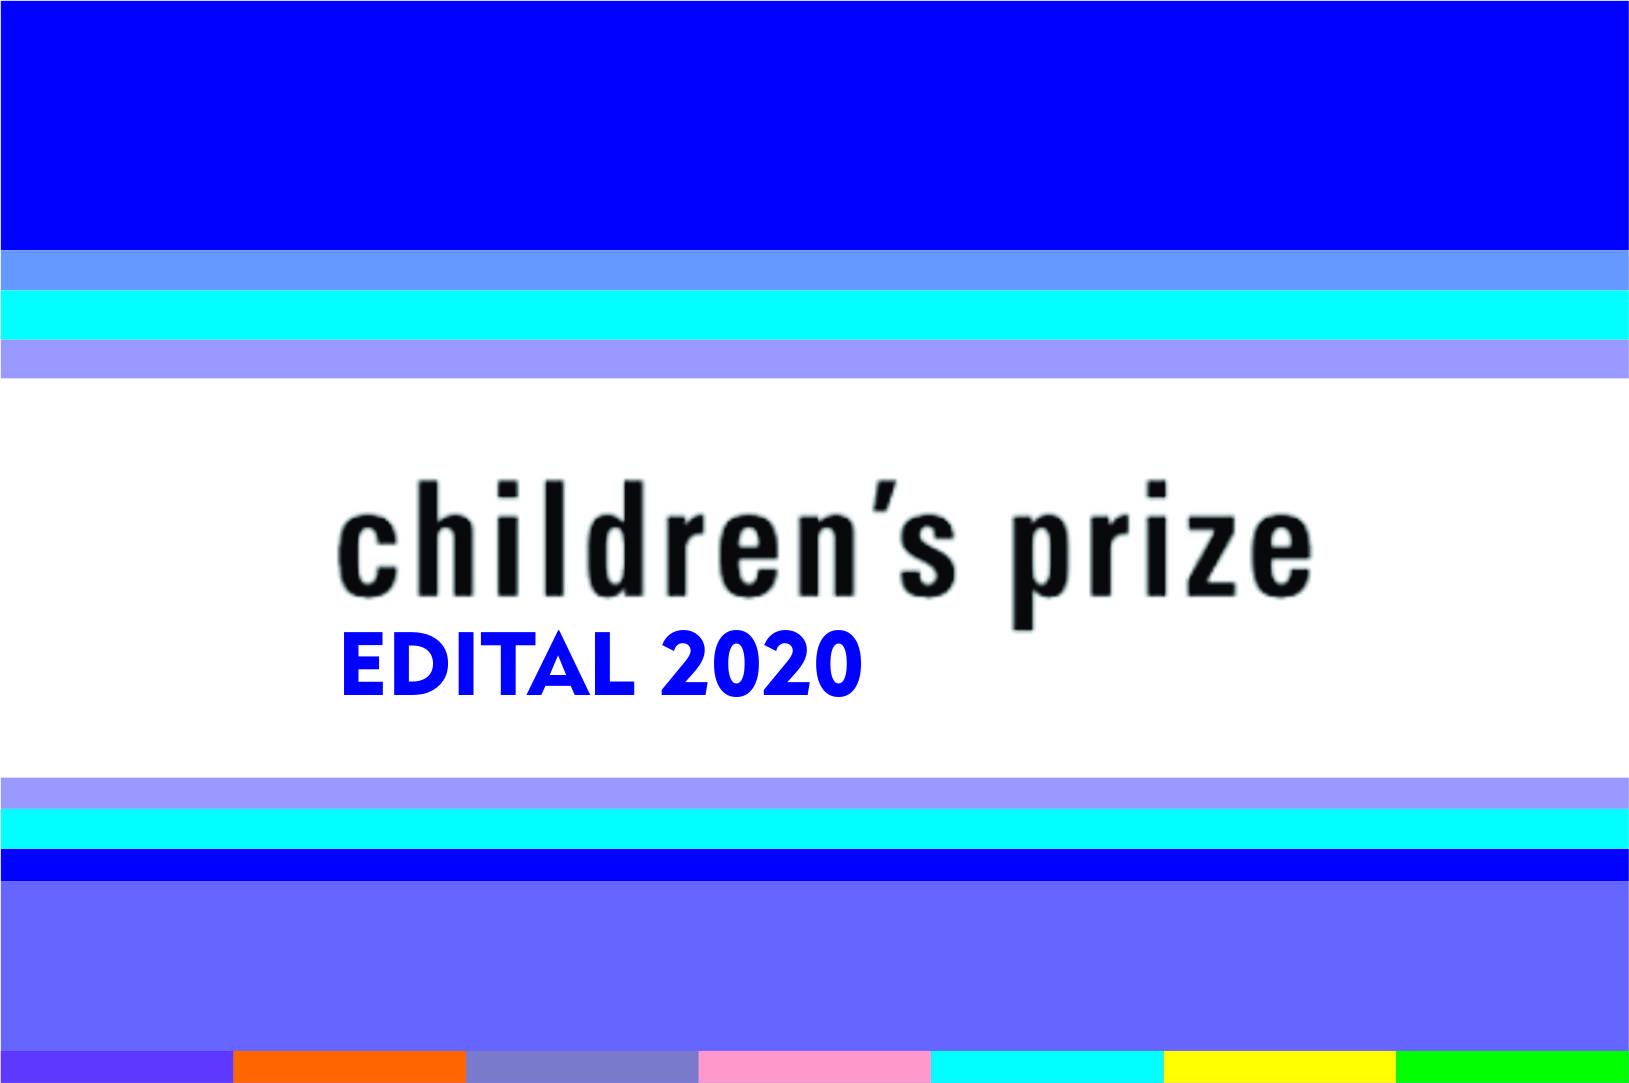 Edital Childrens Prize 2020